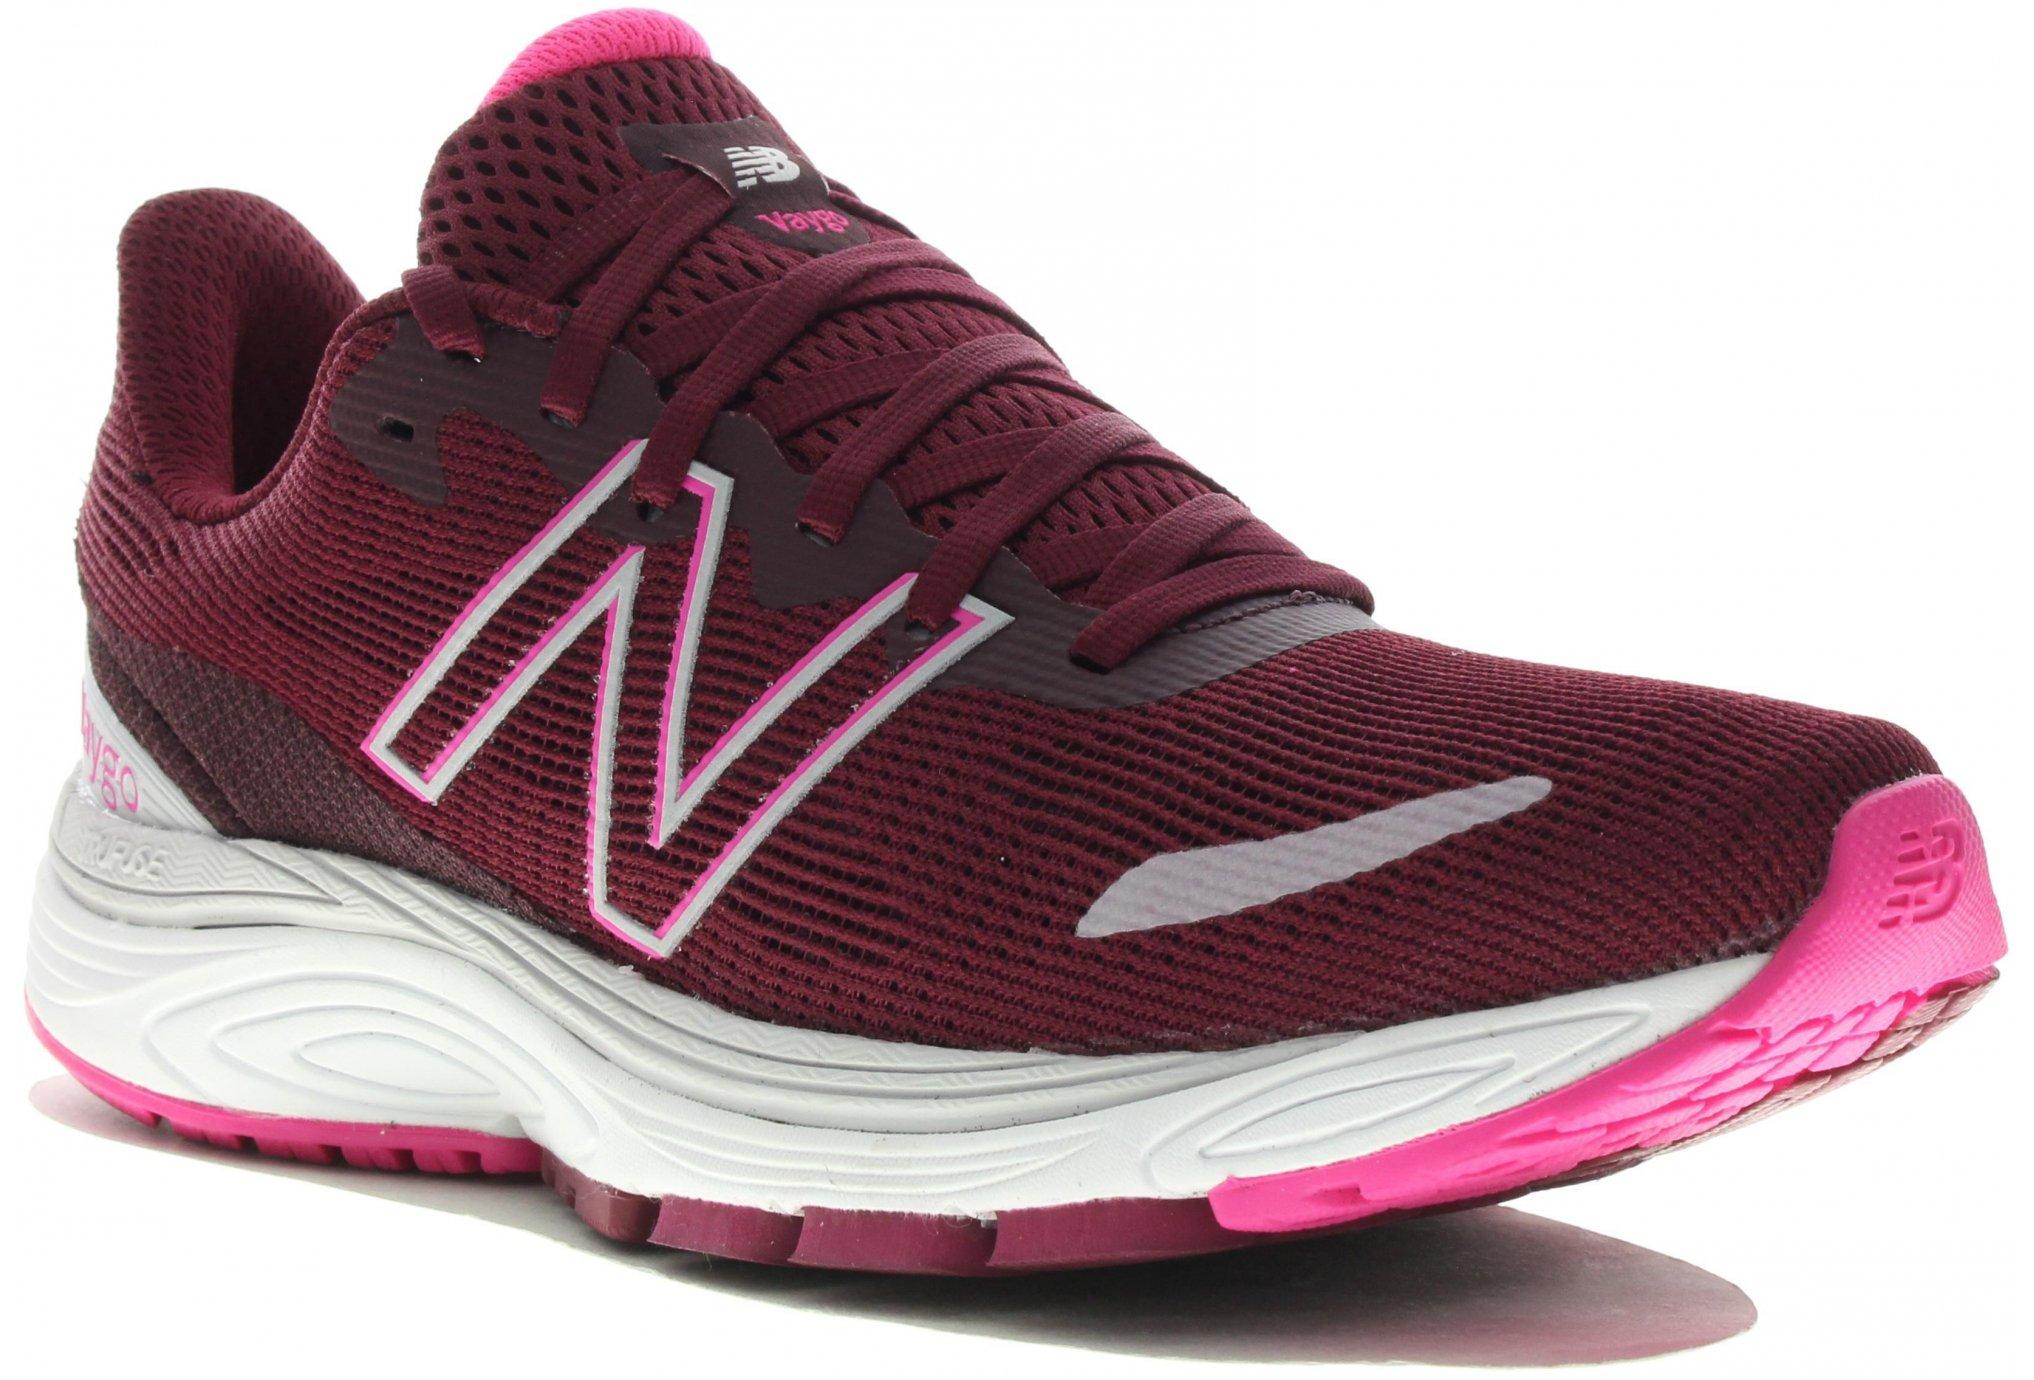 New Balance Vaygo V2 W Chaussures running femme